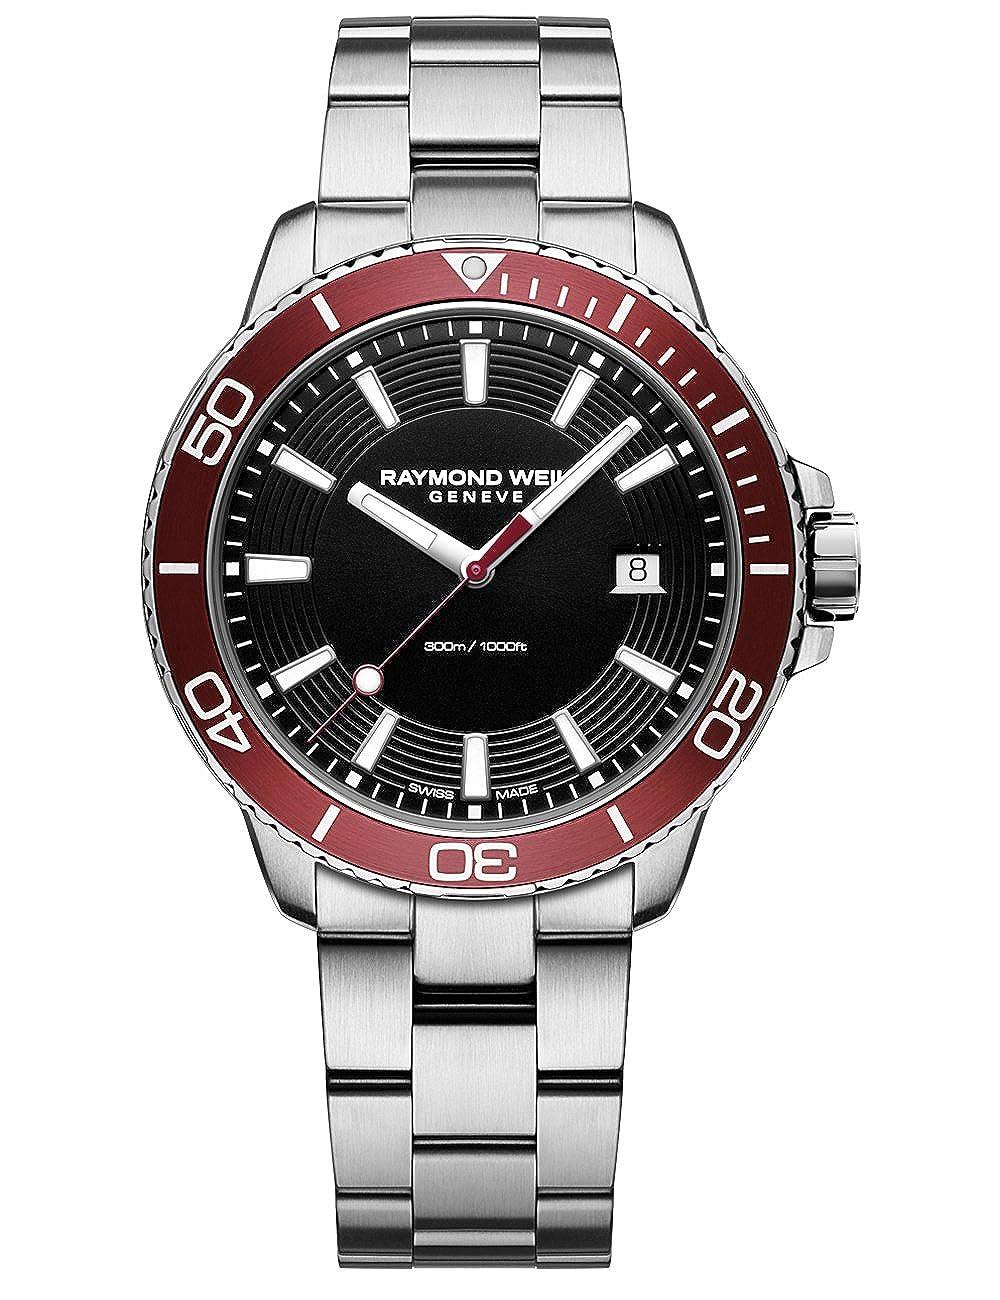 Raymond Weil Men s Tango 301 Quartz Watch with Stainless-Steel Strap, Silver, 20 Model 8260-ST4-20001